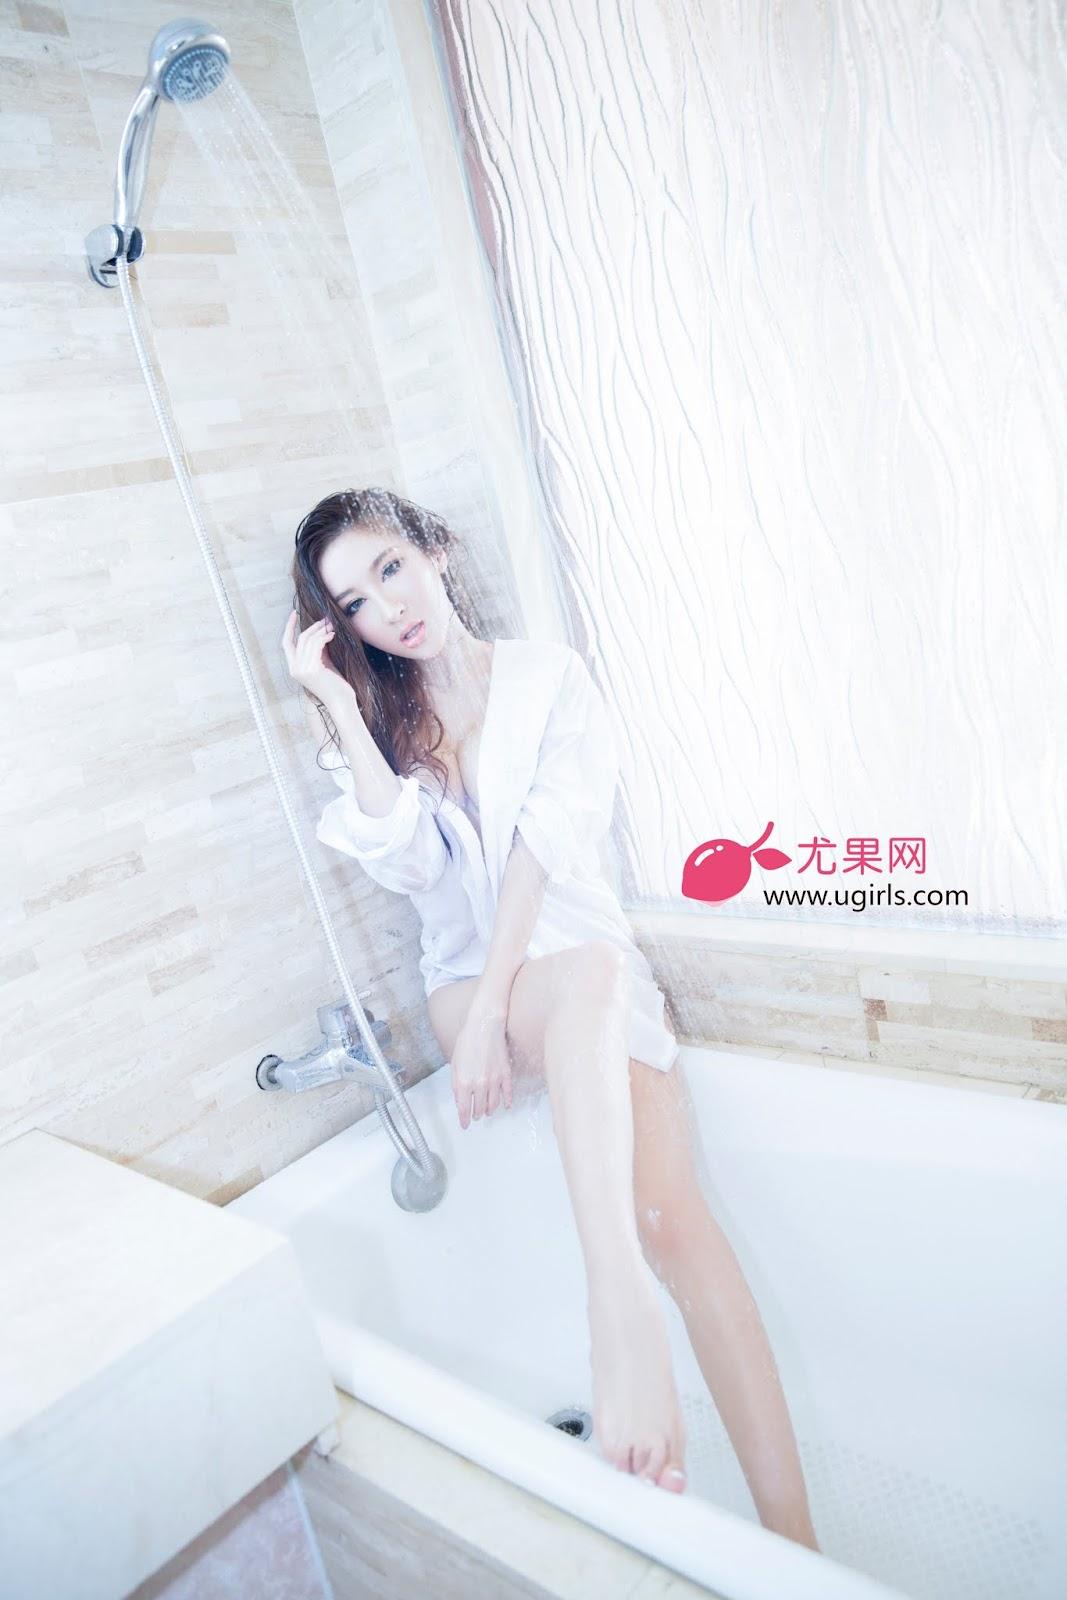 A14A6870 - Hot Photo UGIRLS NO.6 Nude Girl